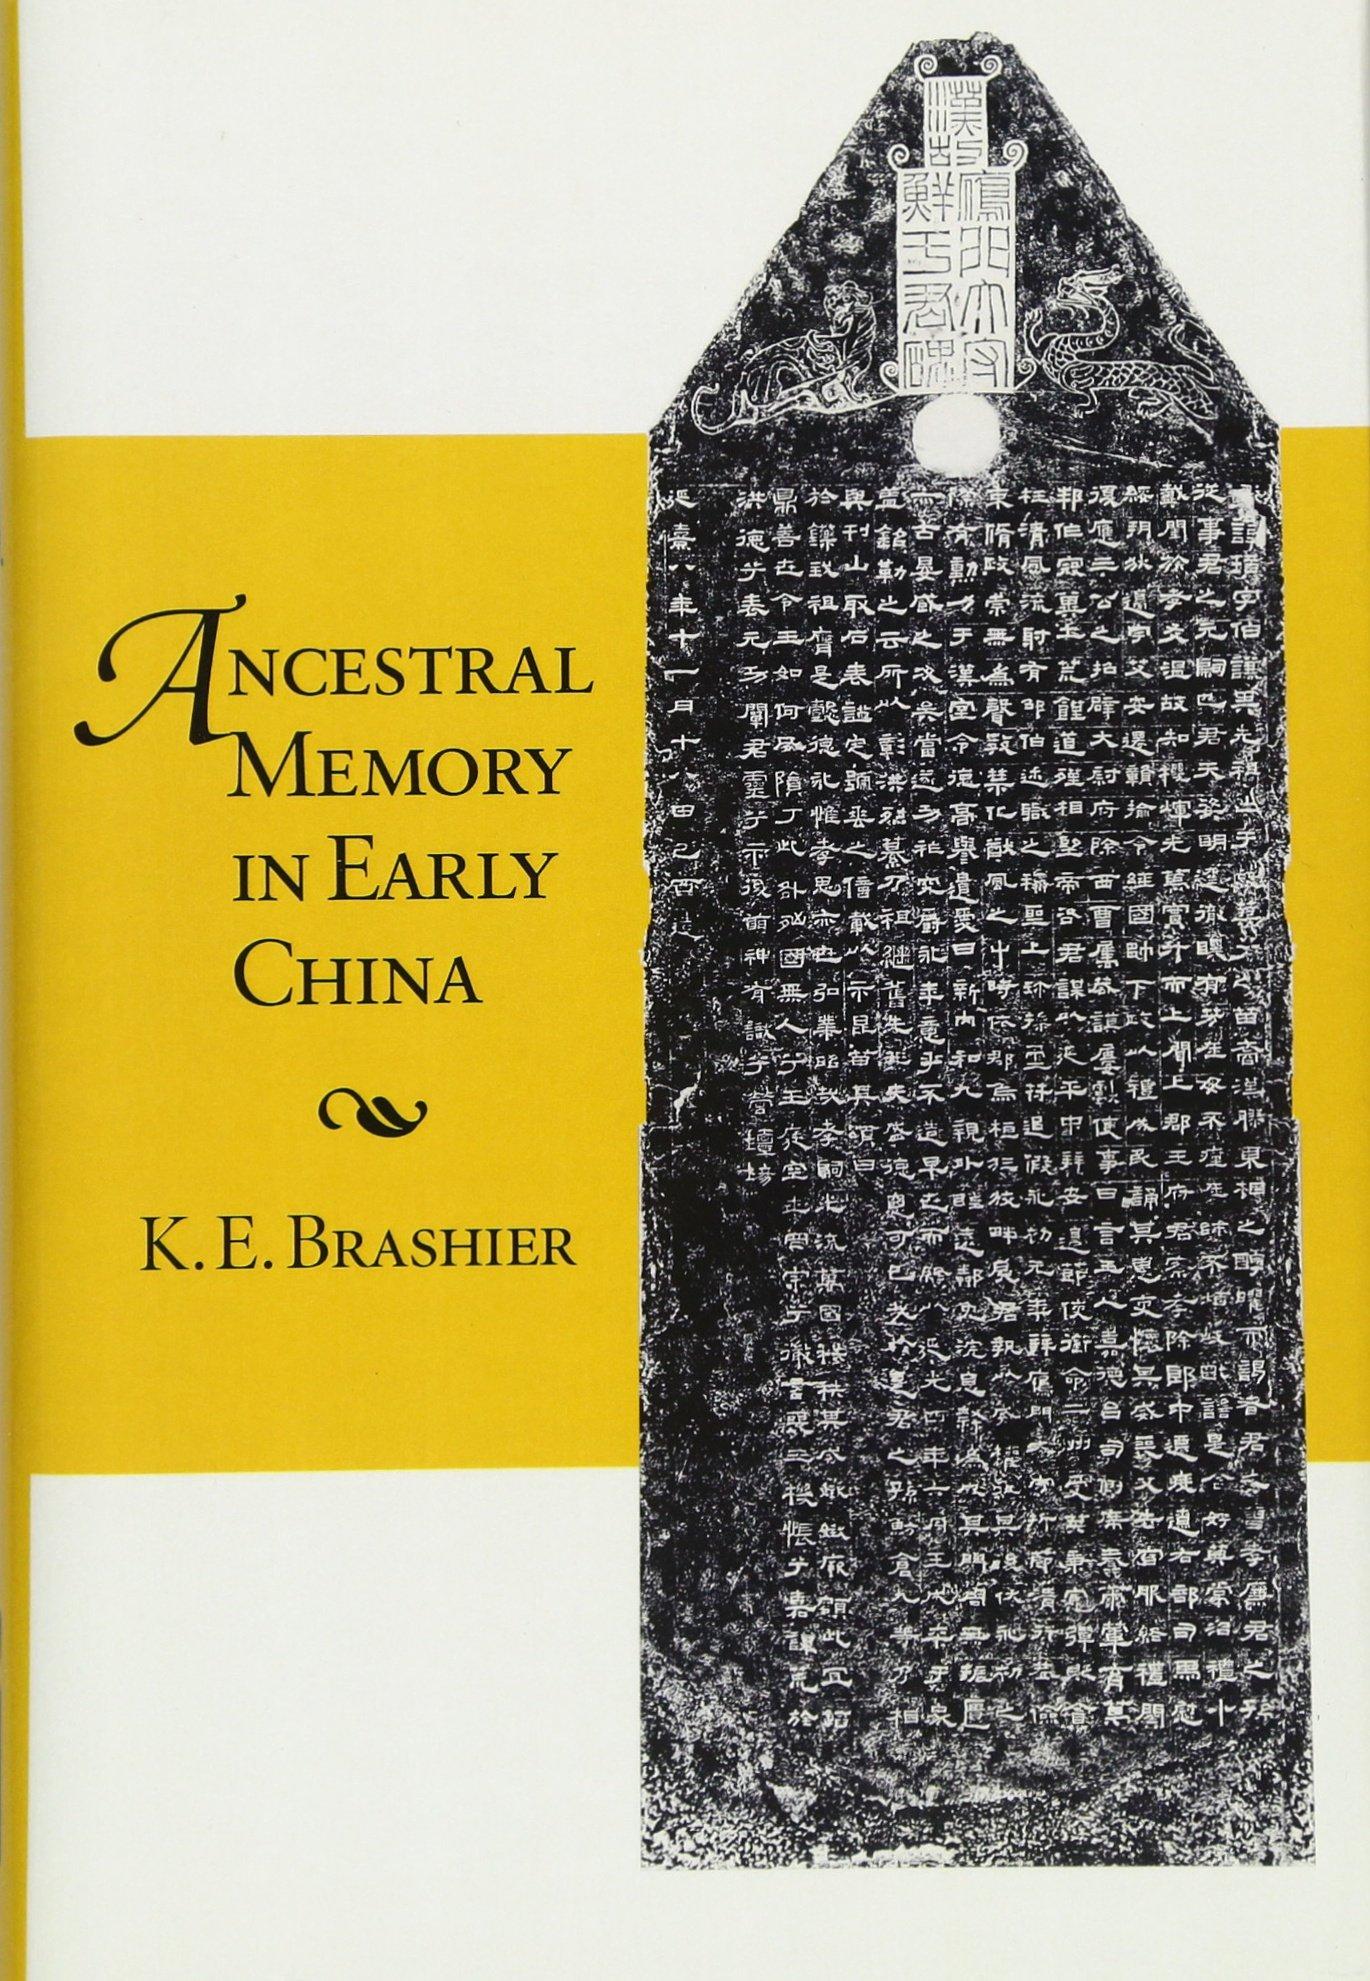 Ancestral Memory in Early China (Harvard-Yenching Institute Monograph  Series): K. E. Brashier: 9780674056077: Amazon.com: Books